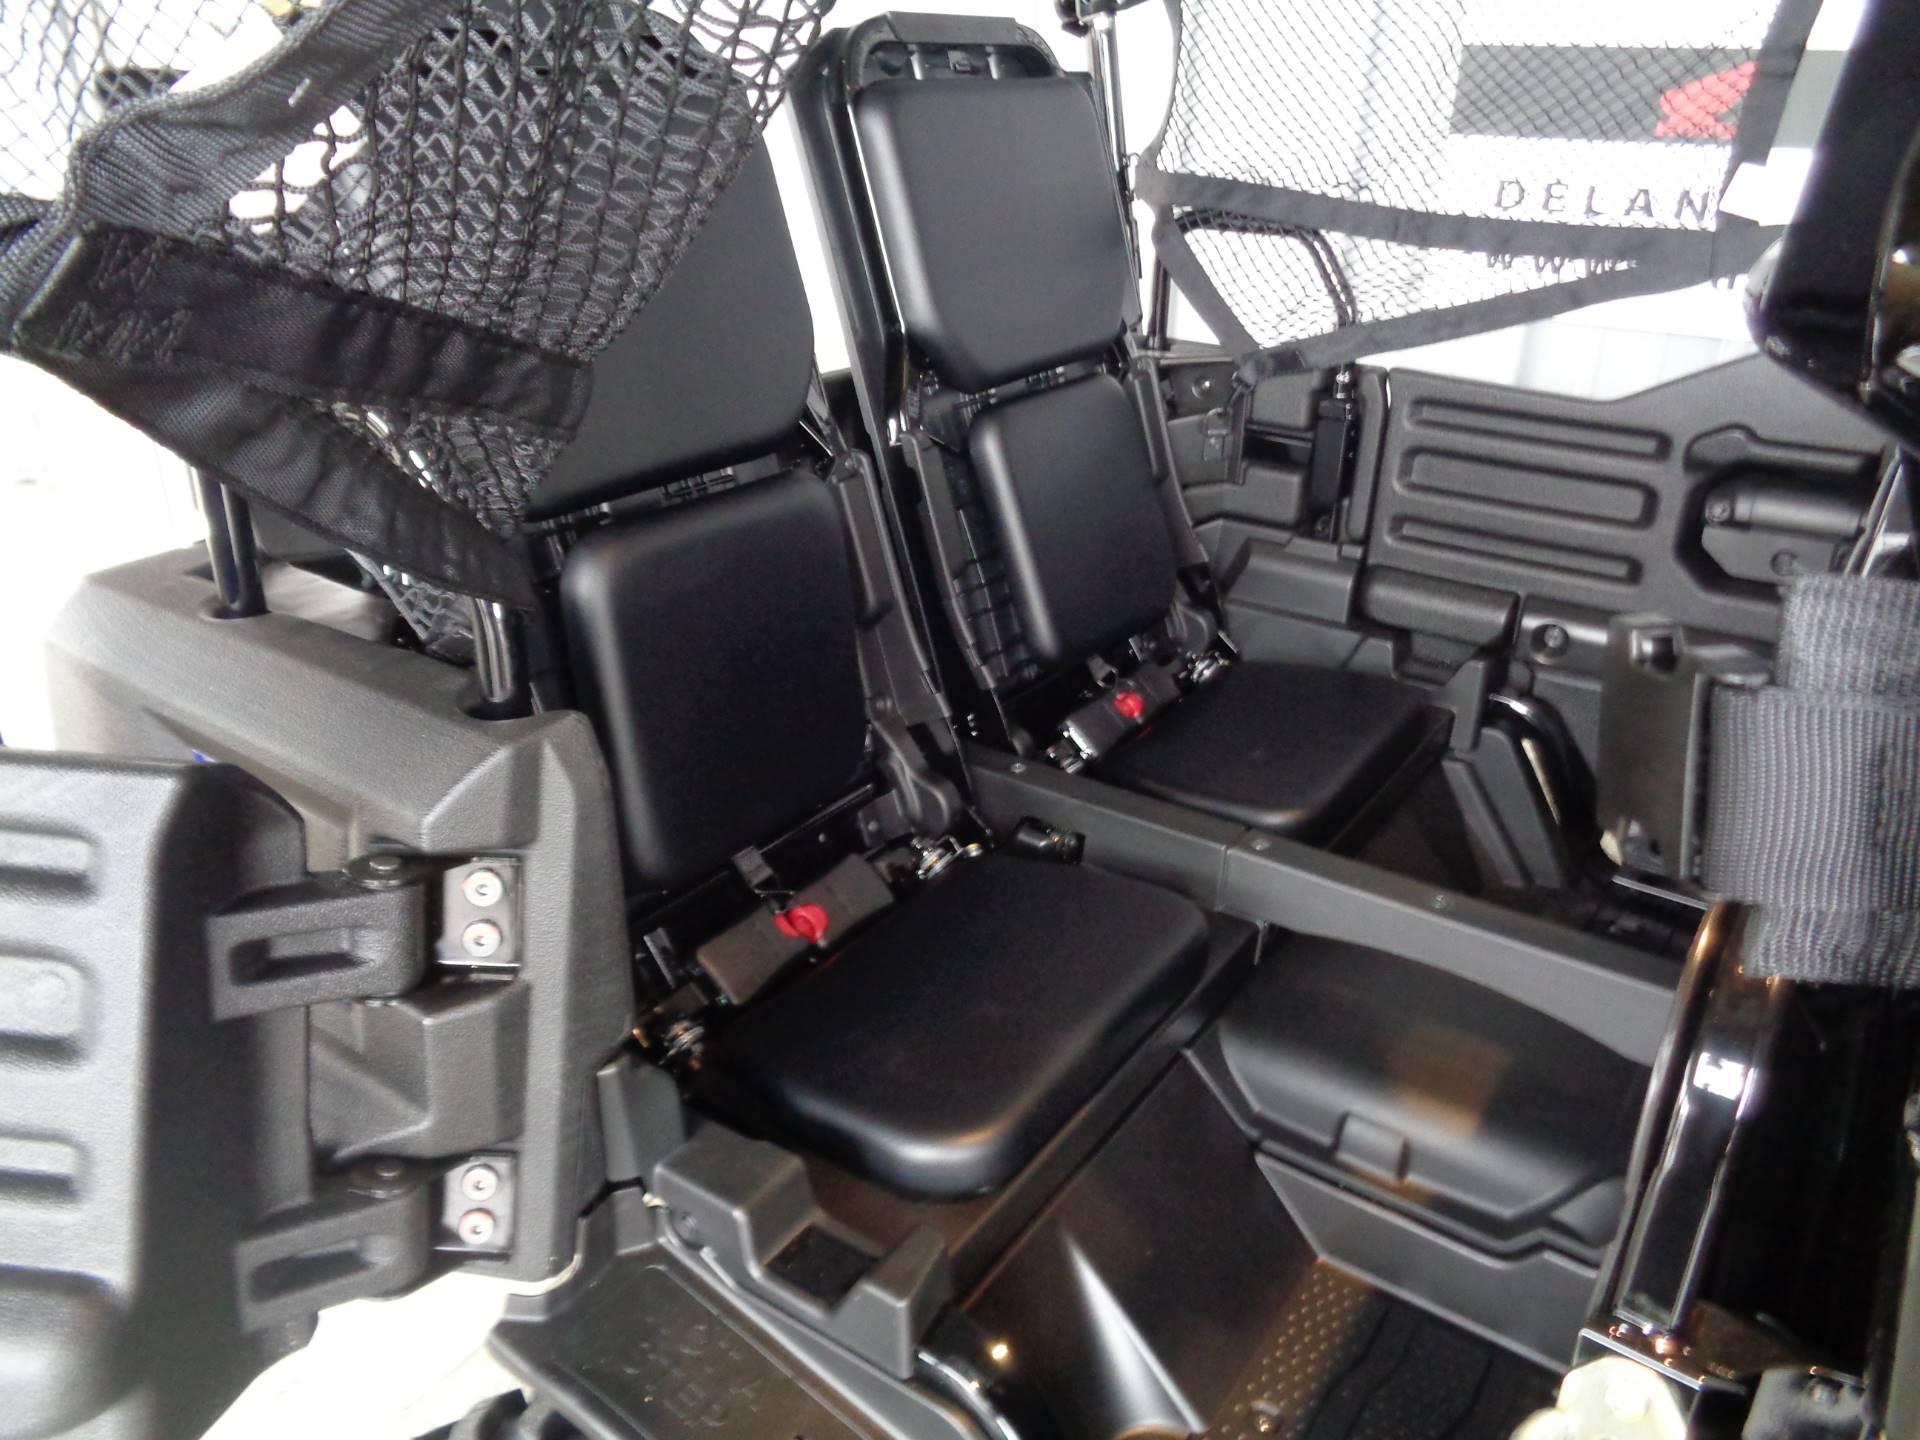 2019 Honda Pioneer 700-4 Deluxe 9